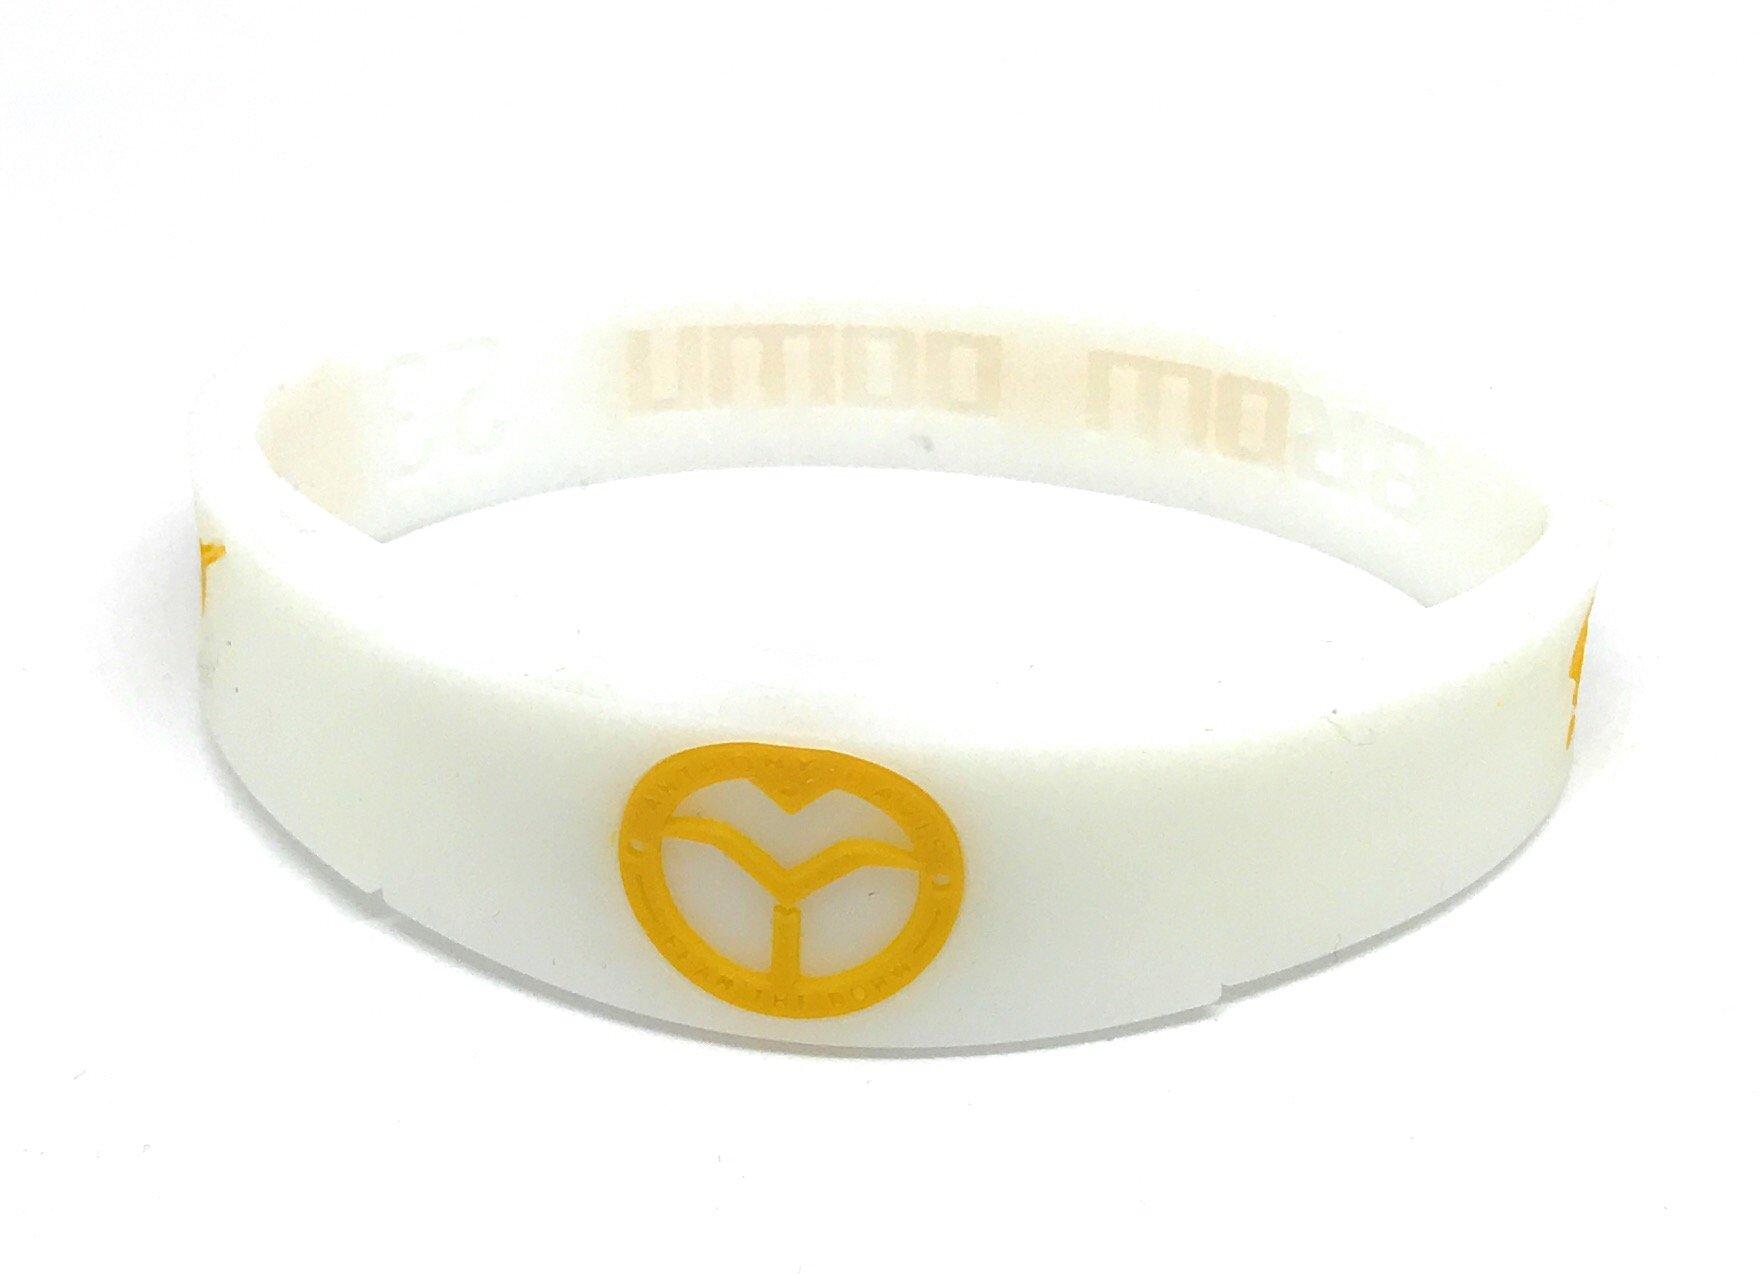 KIDS SportsBraceletsPro REVERSIBLE KIDS Wristband KIDS SIZE 6.7'' Size Bracelet (Davis KID 6.7'' White)